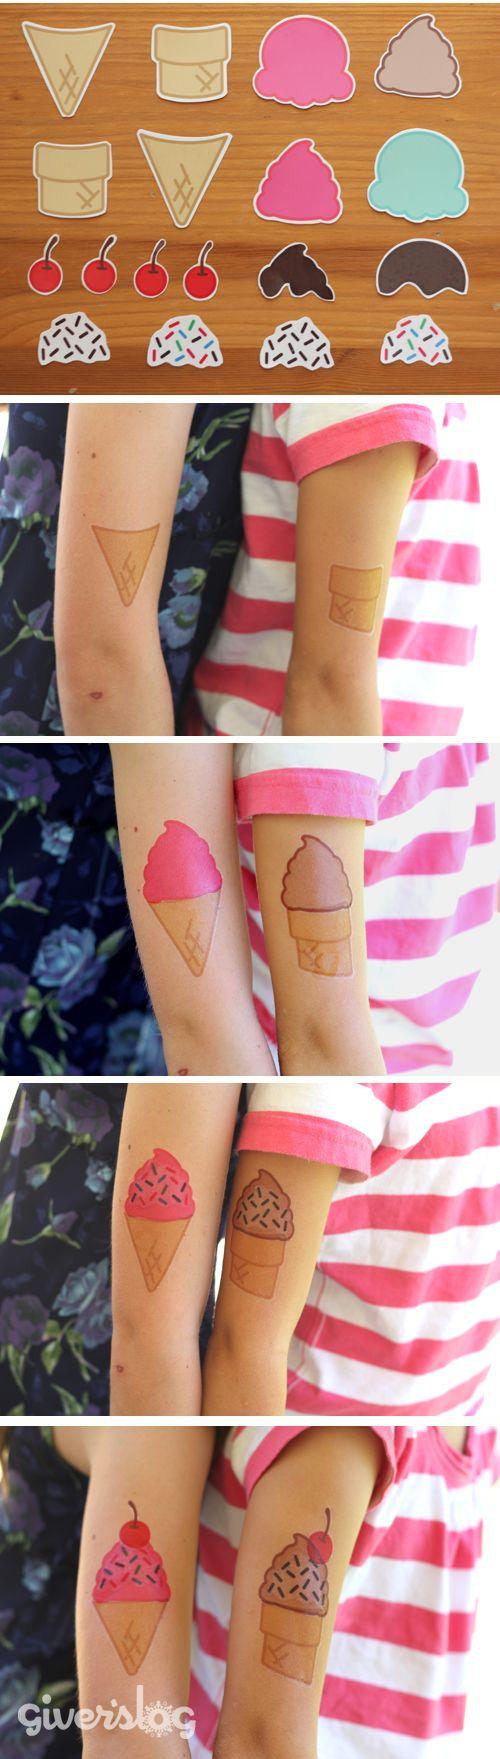 best tattoos i like images on pinterest